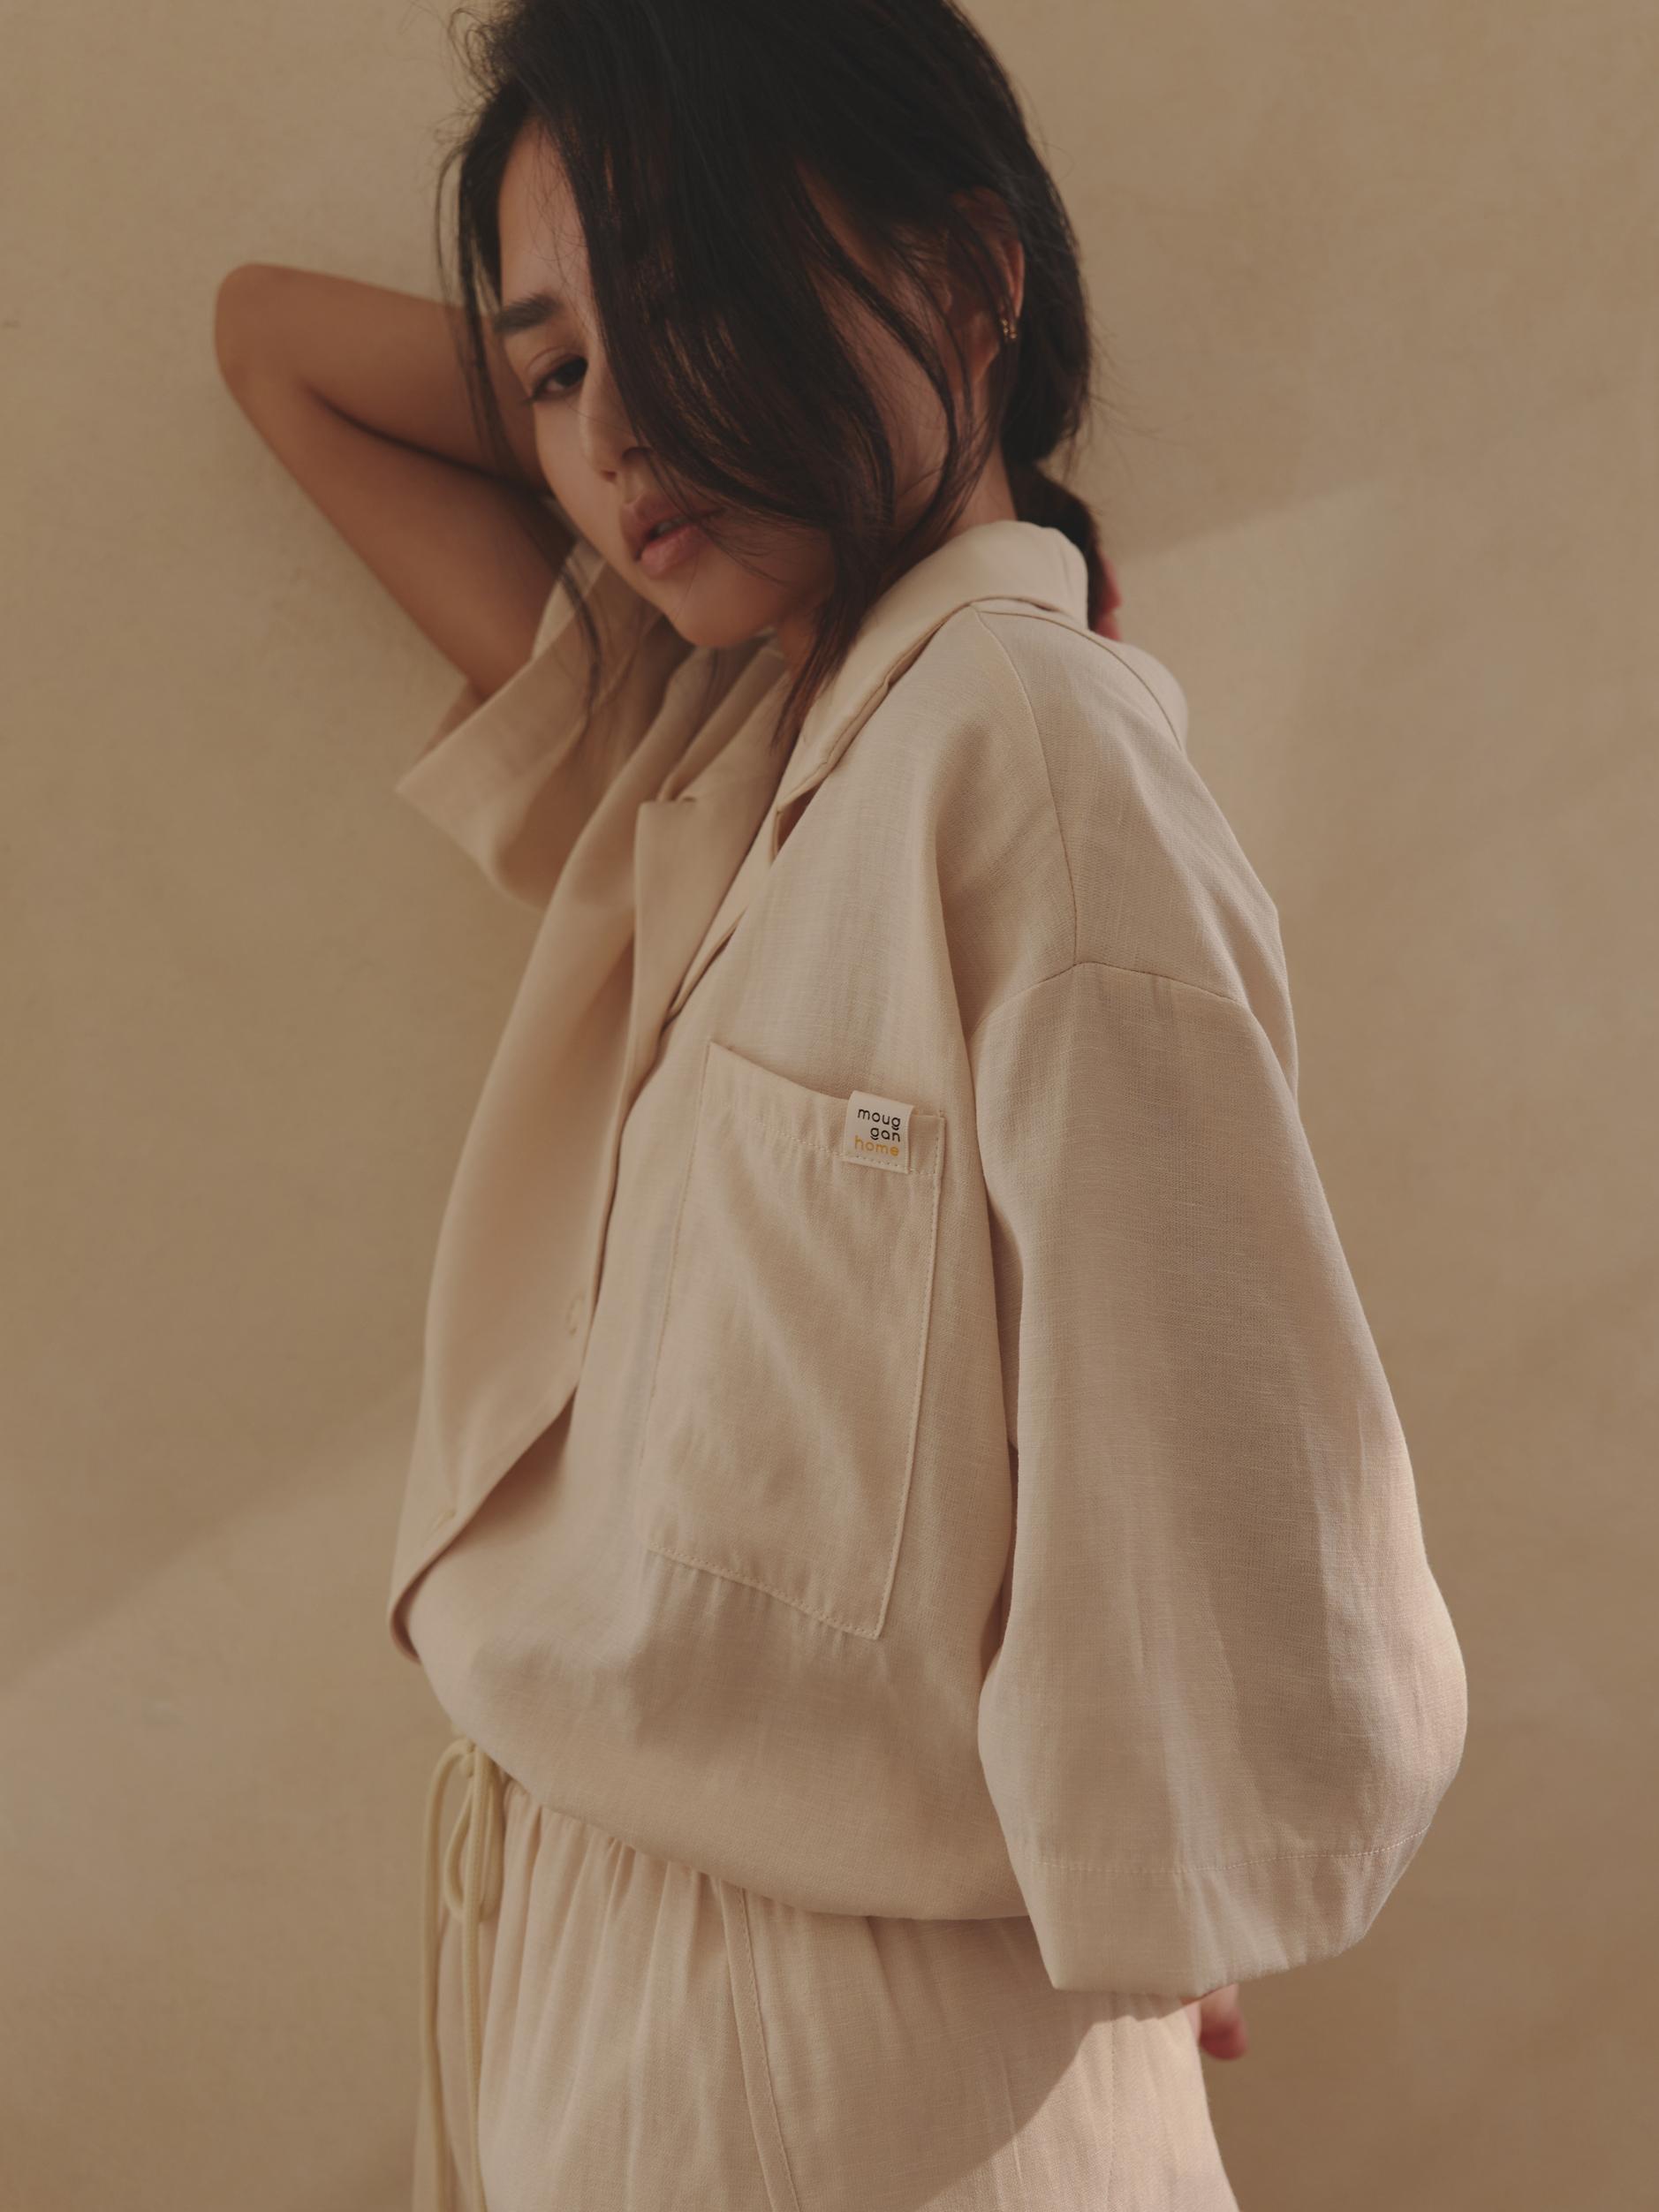 棉麻短袖襯衫 - mouggan home-mouggan